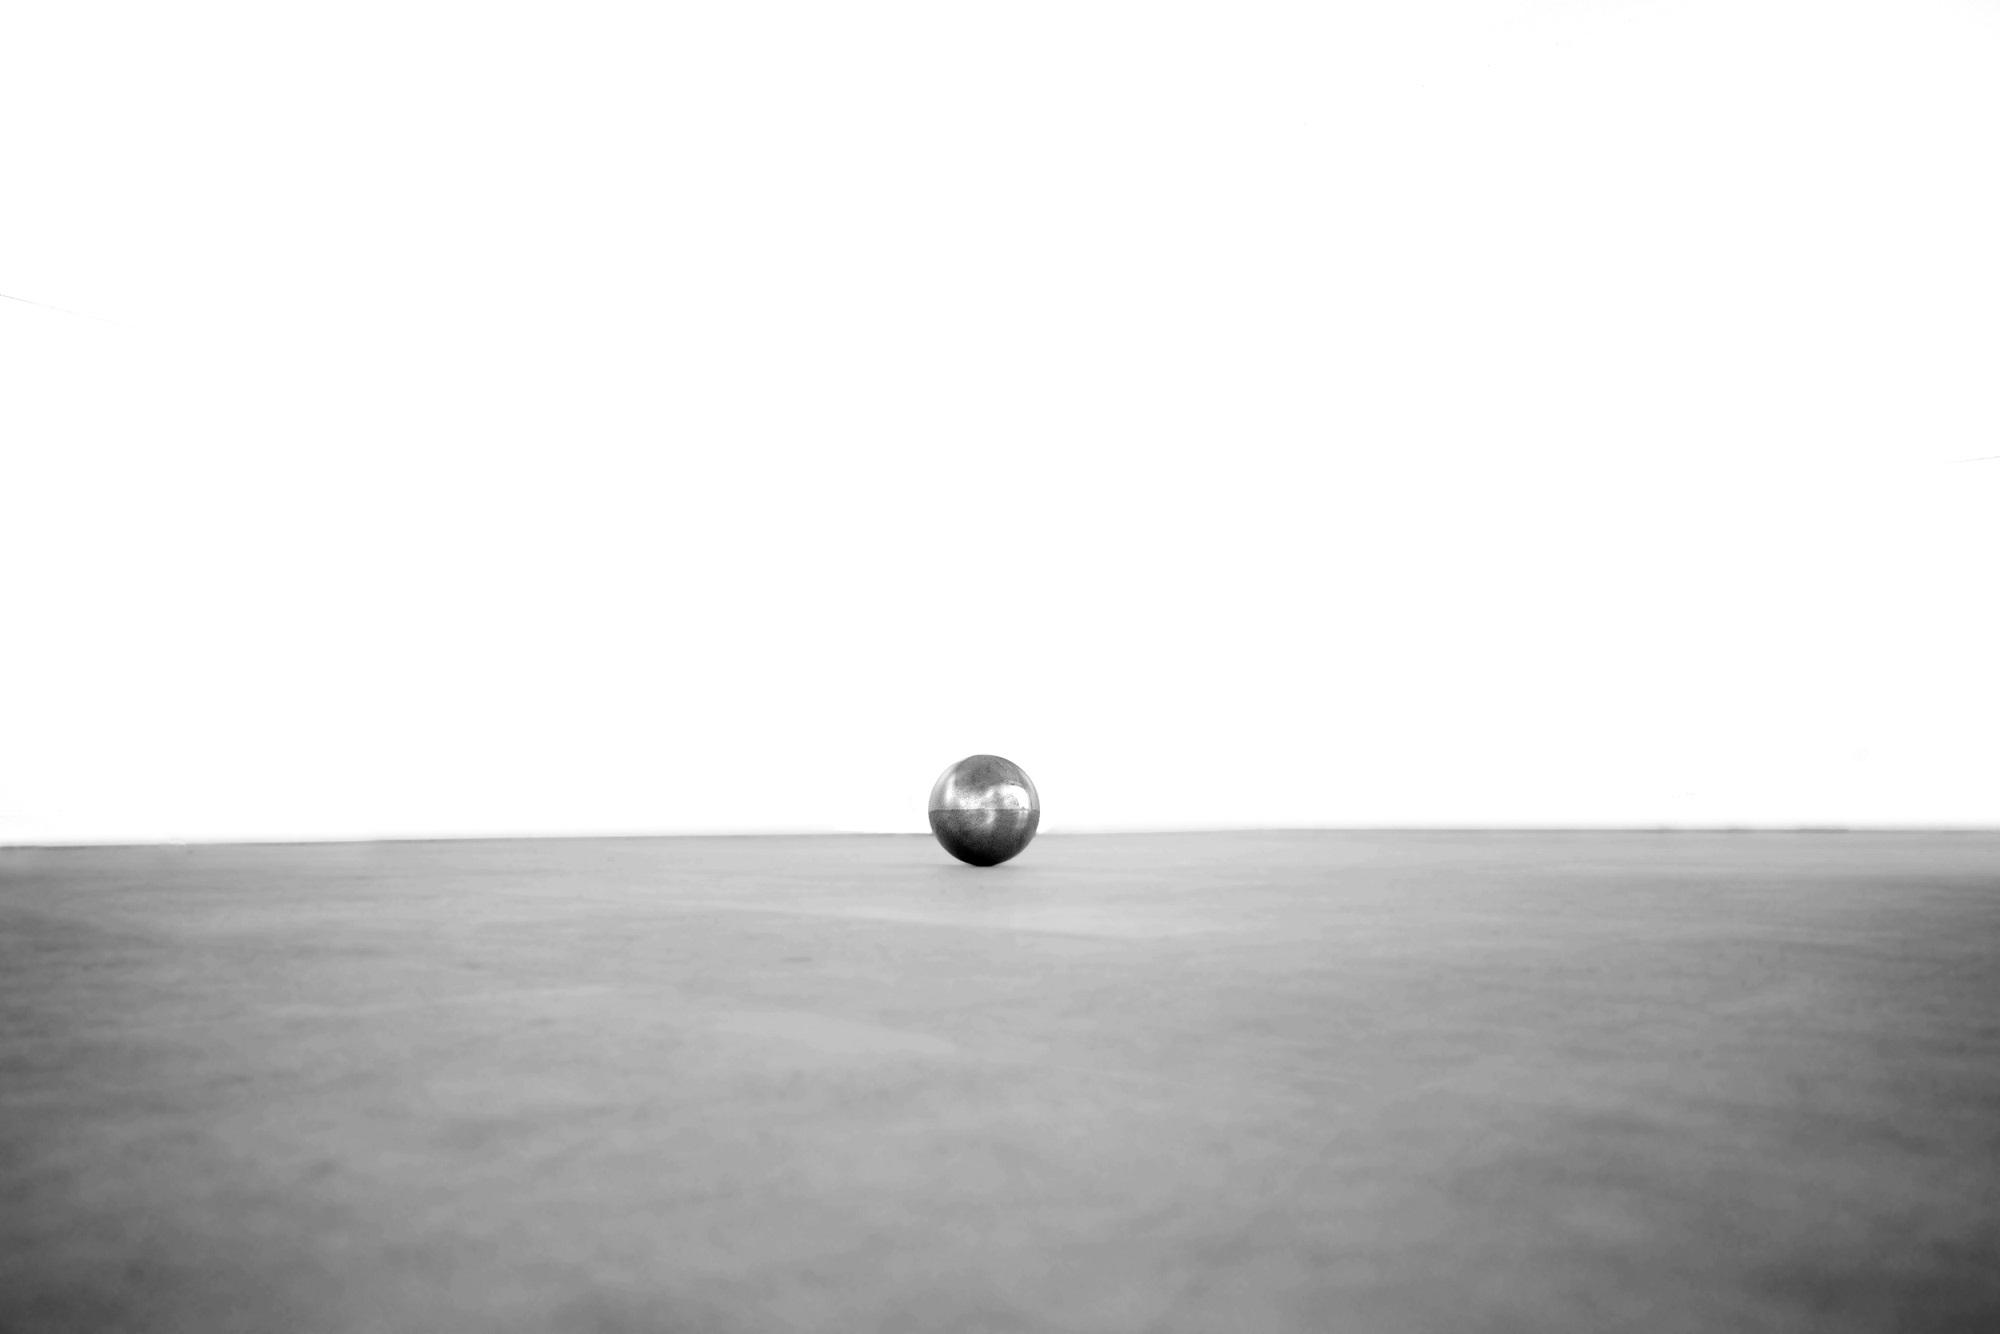 Alessandro Bernardini, Strike, 2017, sfera di acciaio, 10 cm